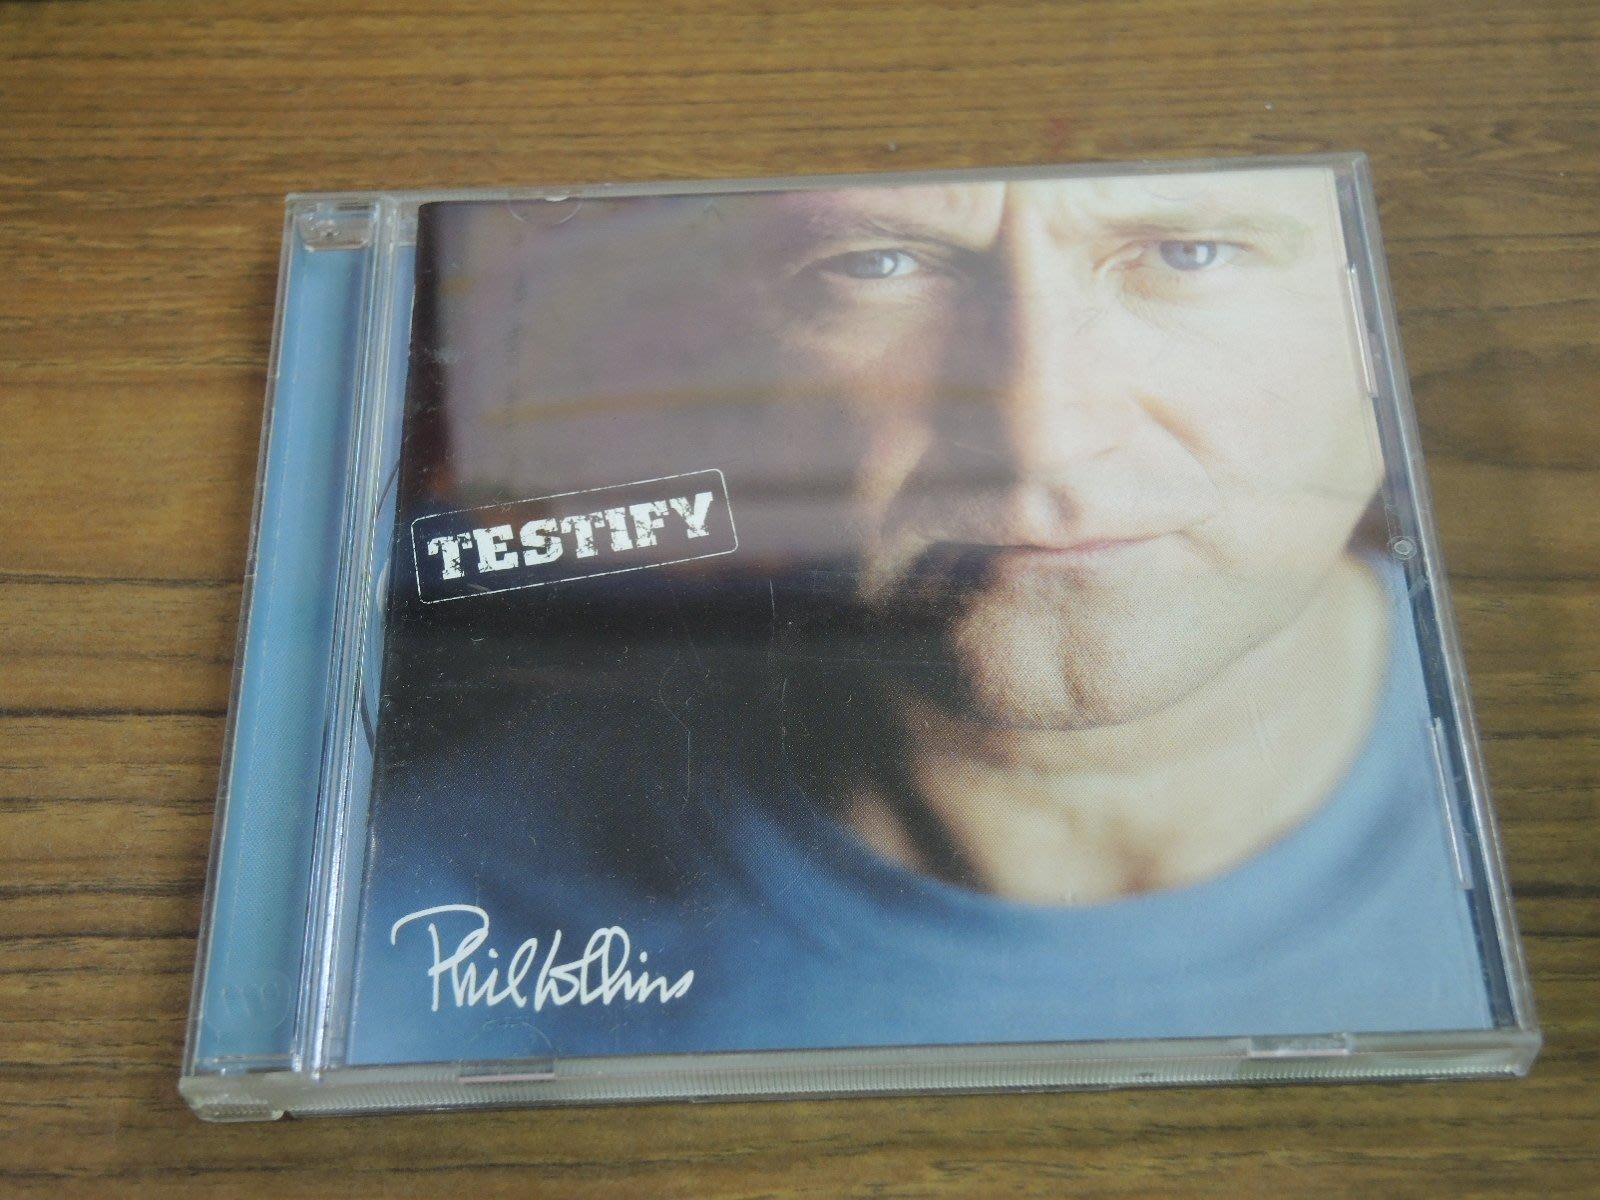 ◎MWM◎【二手CD】Phil William- Testify 台版, 有歌詞及一張中文簡介, 片況佳